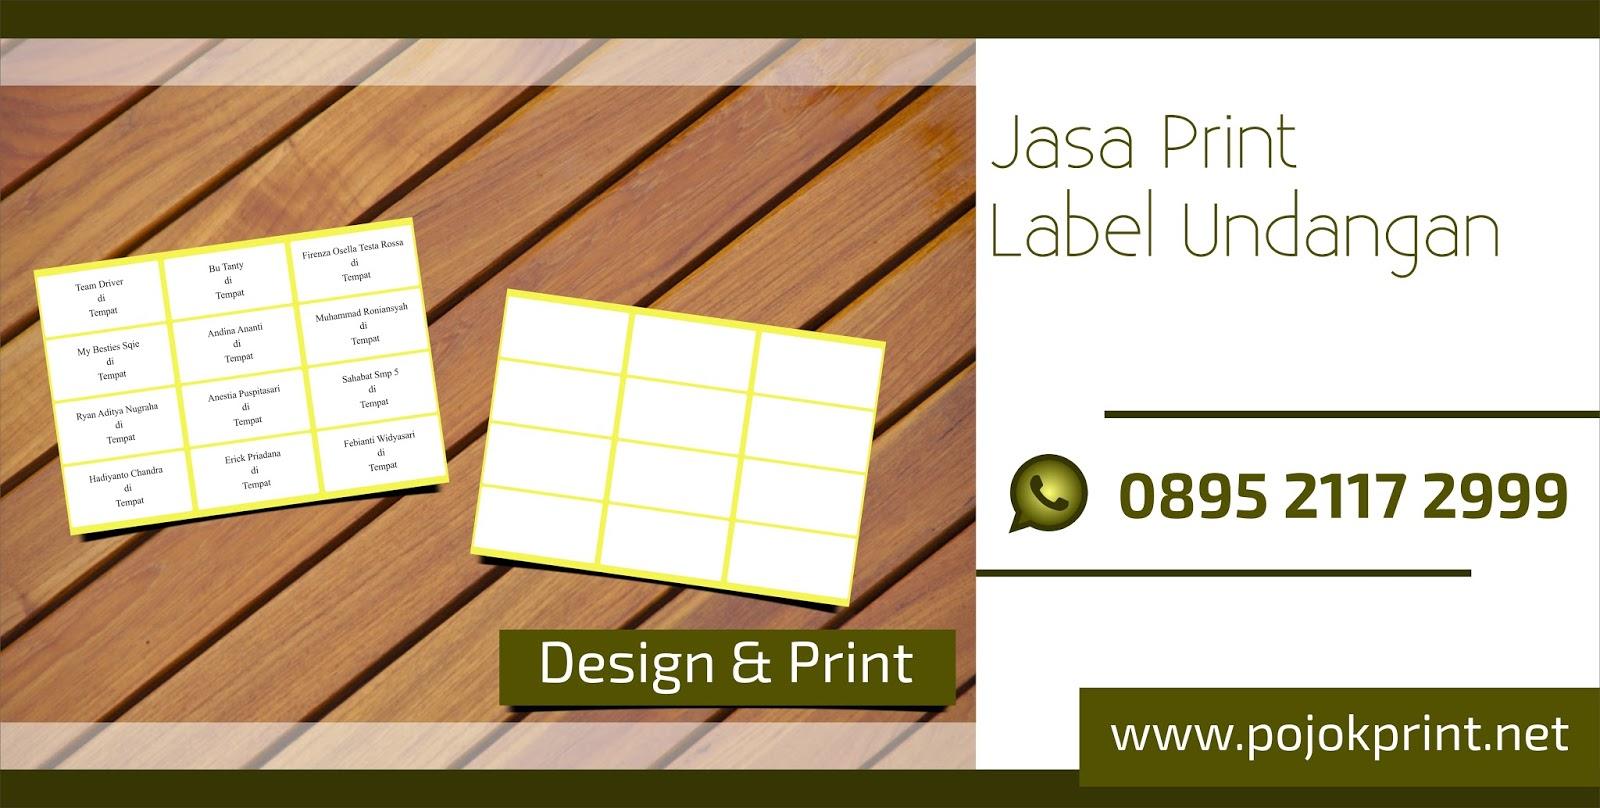 jasa-print-label-undangan